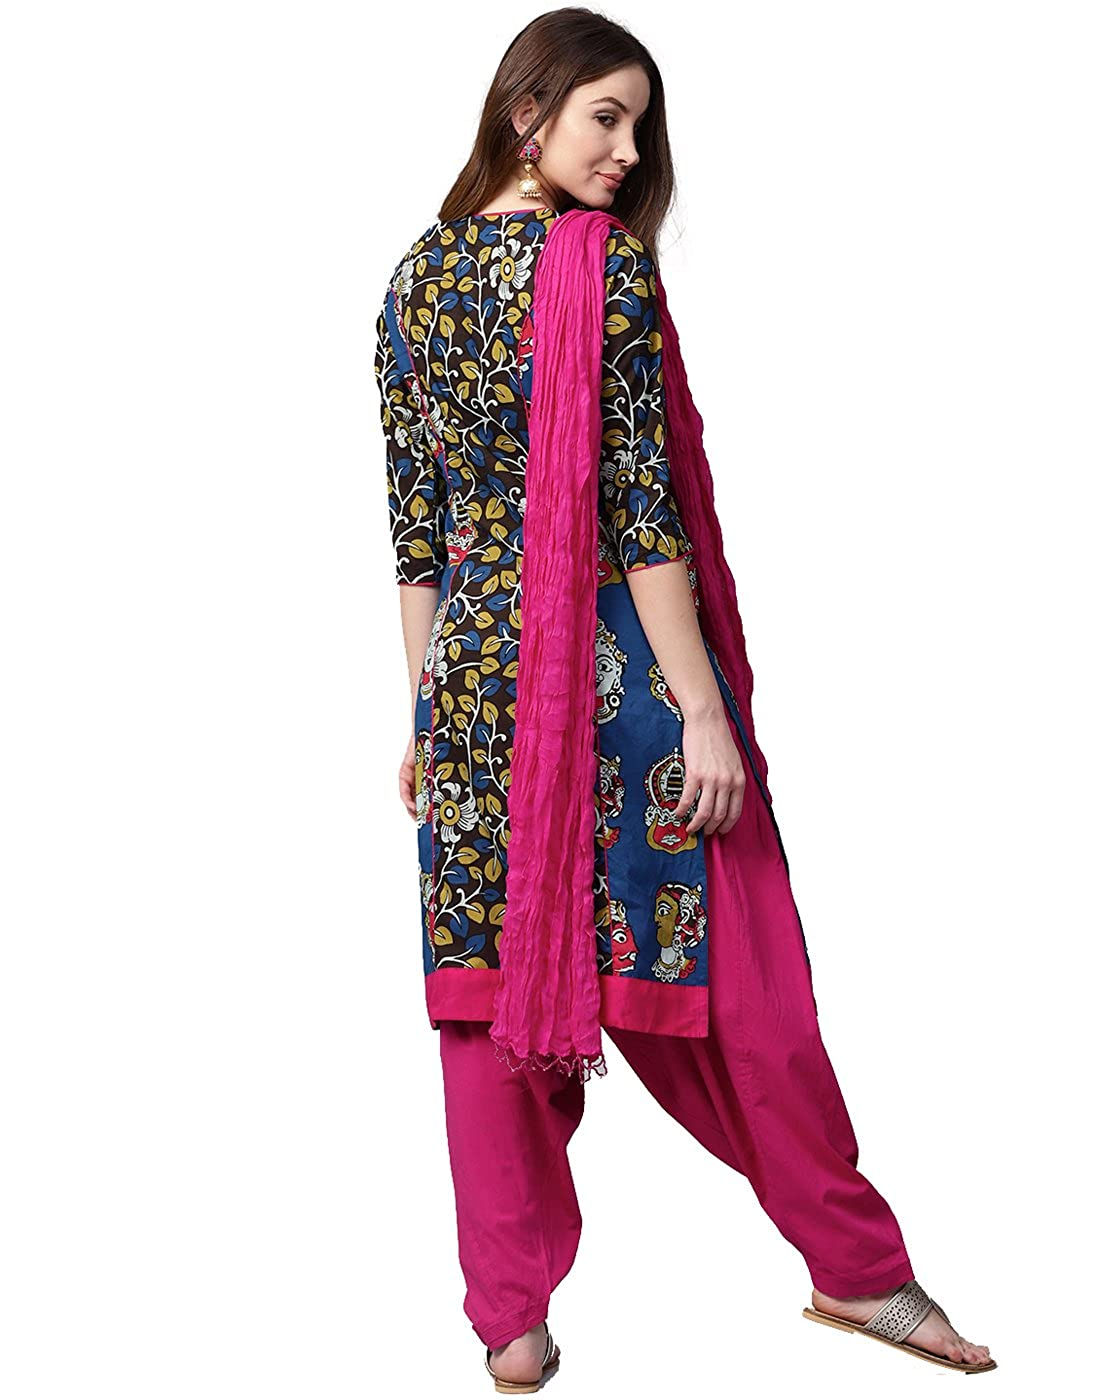 8068d7bd92 Jaipur Kurti Women Brown & Pink Printed Cotton Kurta with Patiala & Dupatta:  Amazon.in: Clothing & Accessories